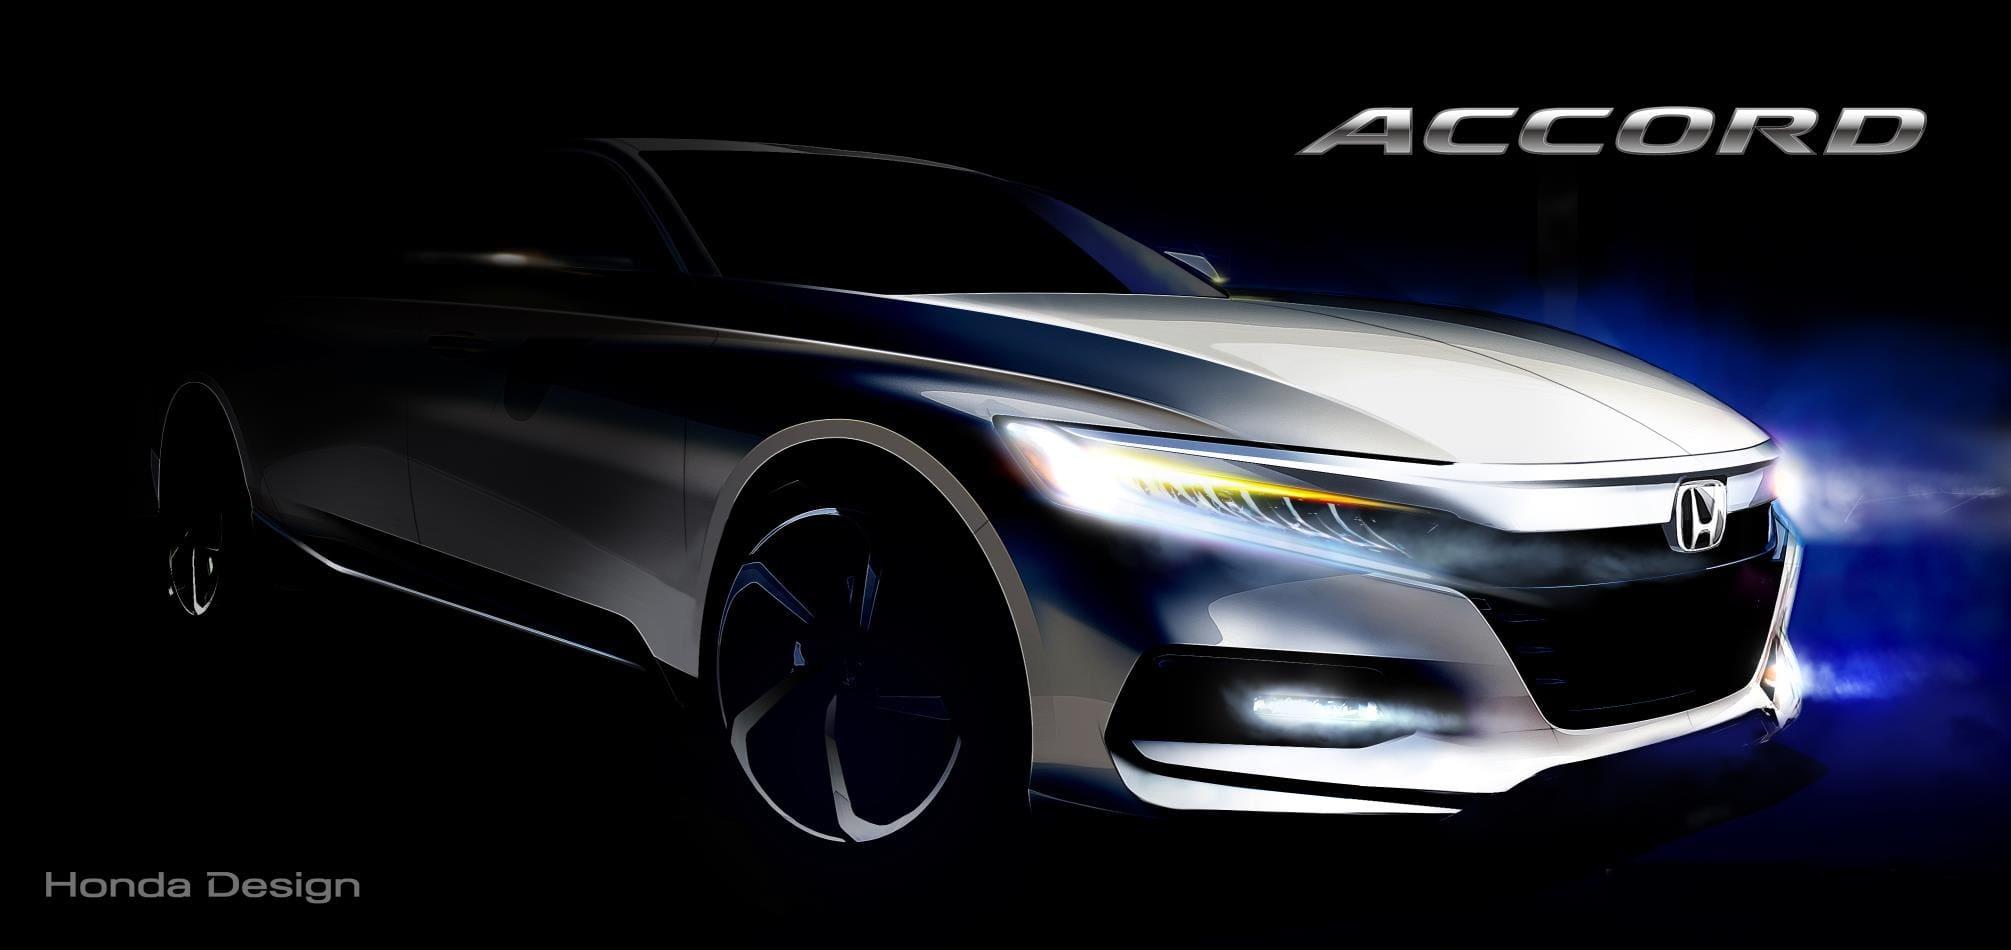 Honda Releases Sketch, Reveals Powertrain Choices of Next-Generation Honda Accord